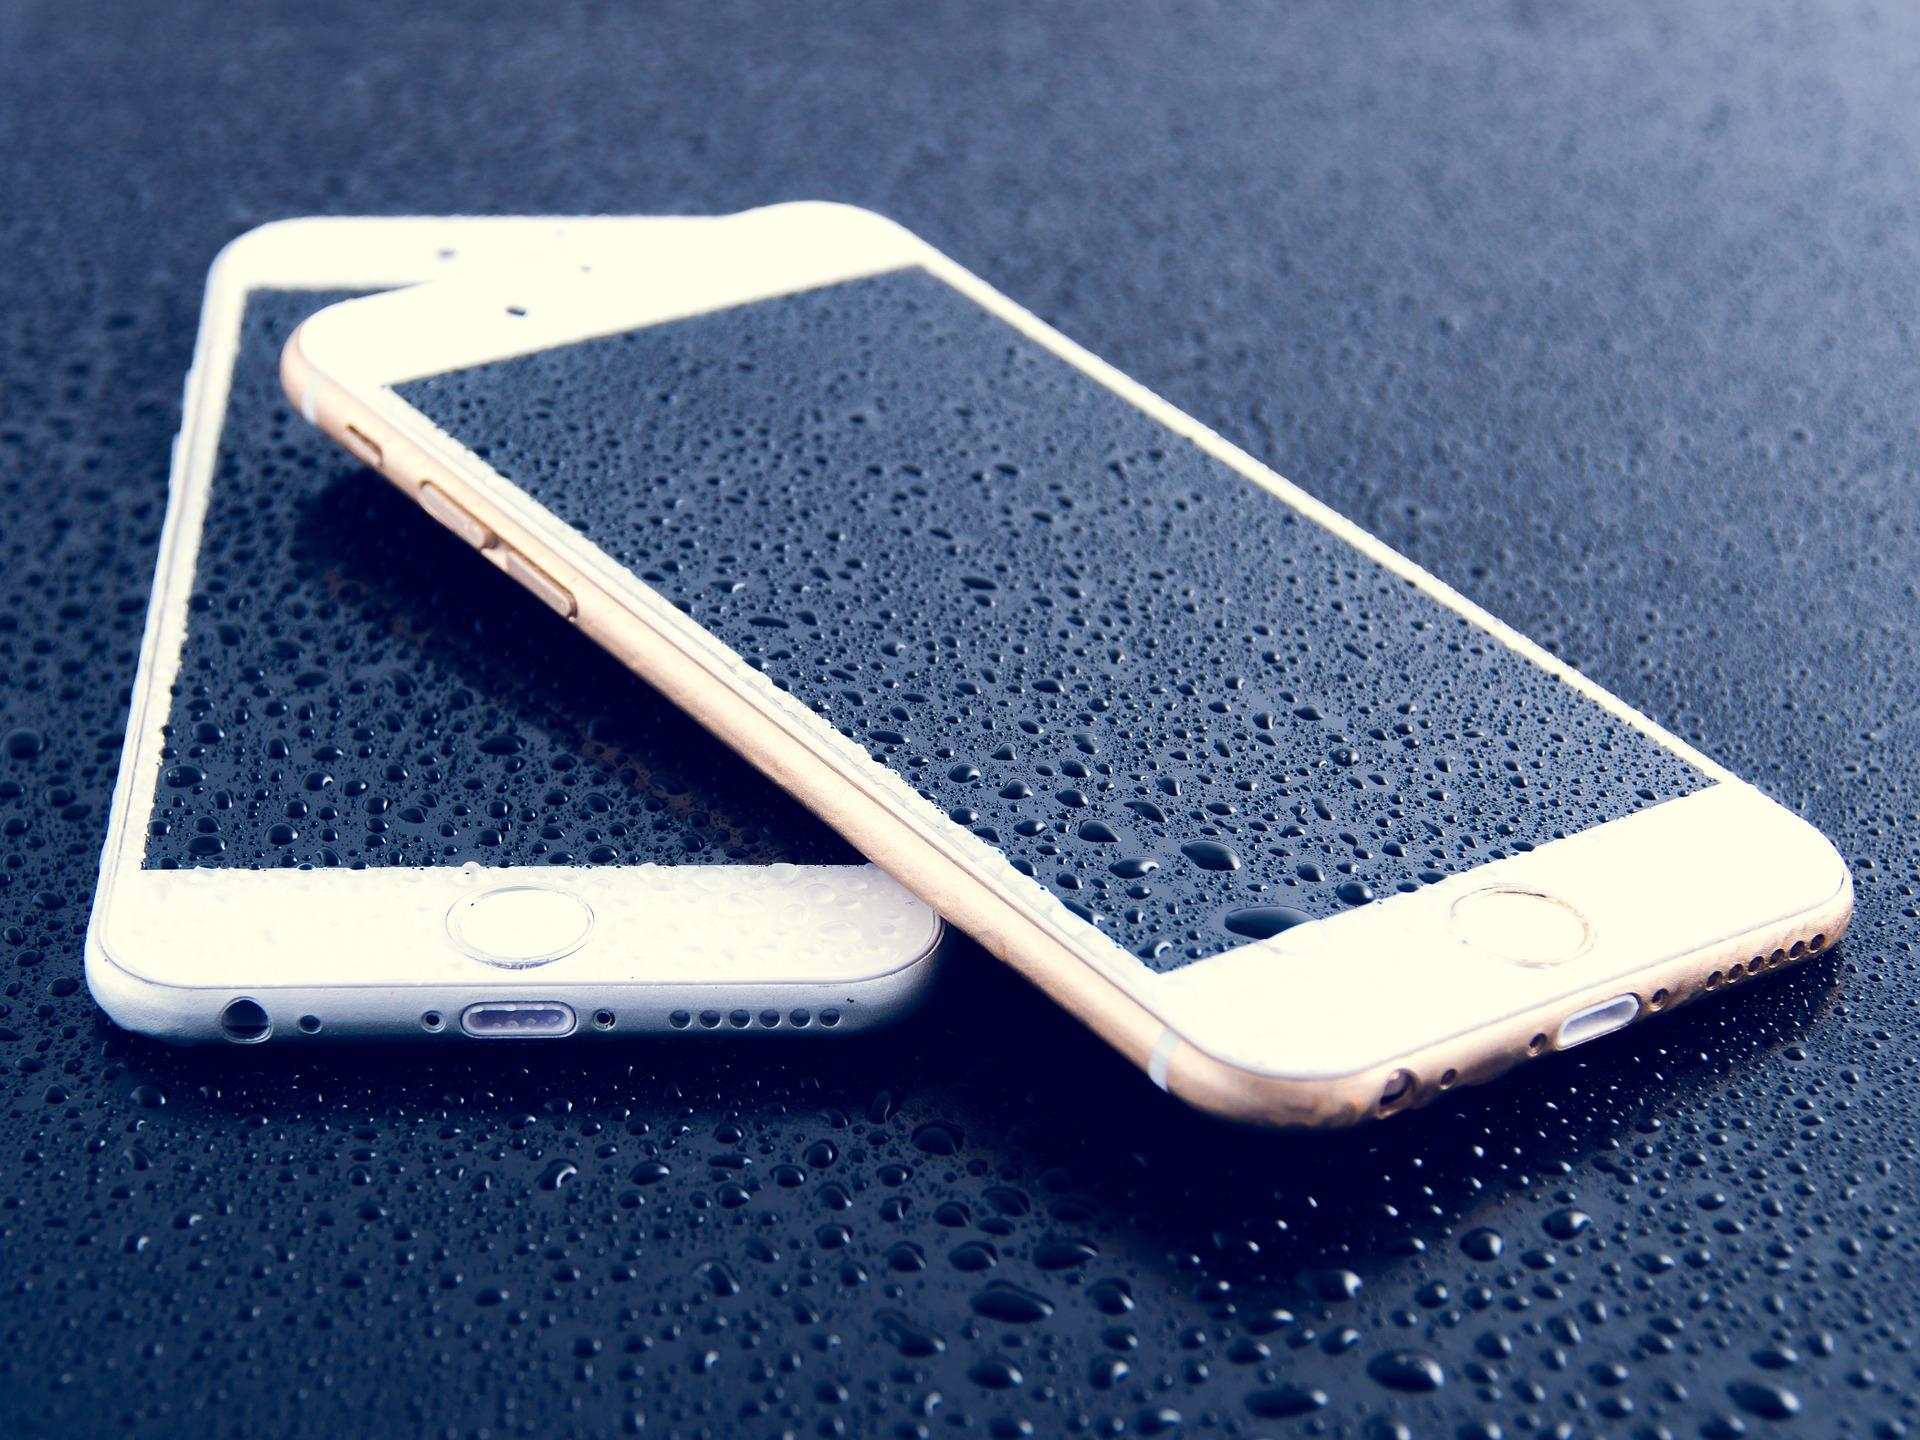 iphone-1067983_1920